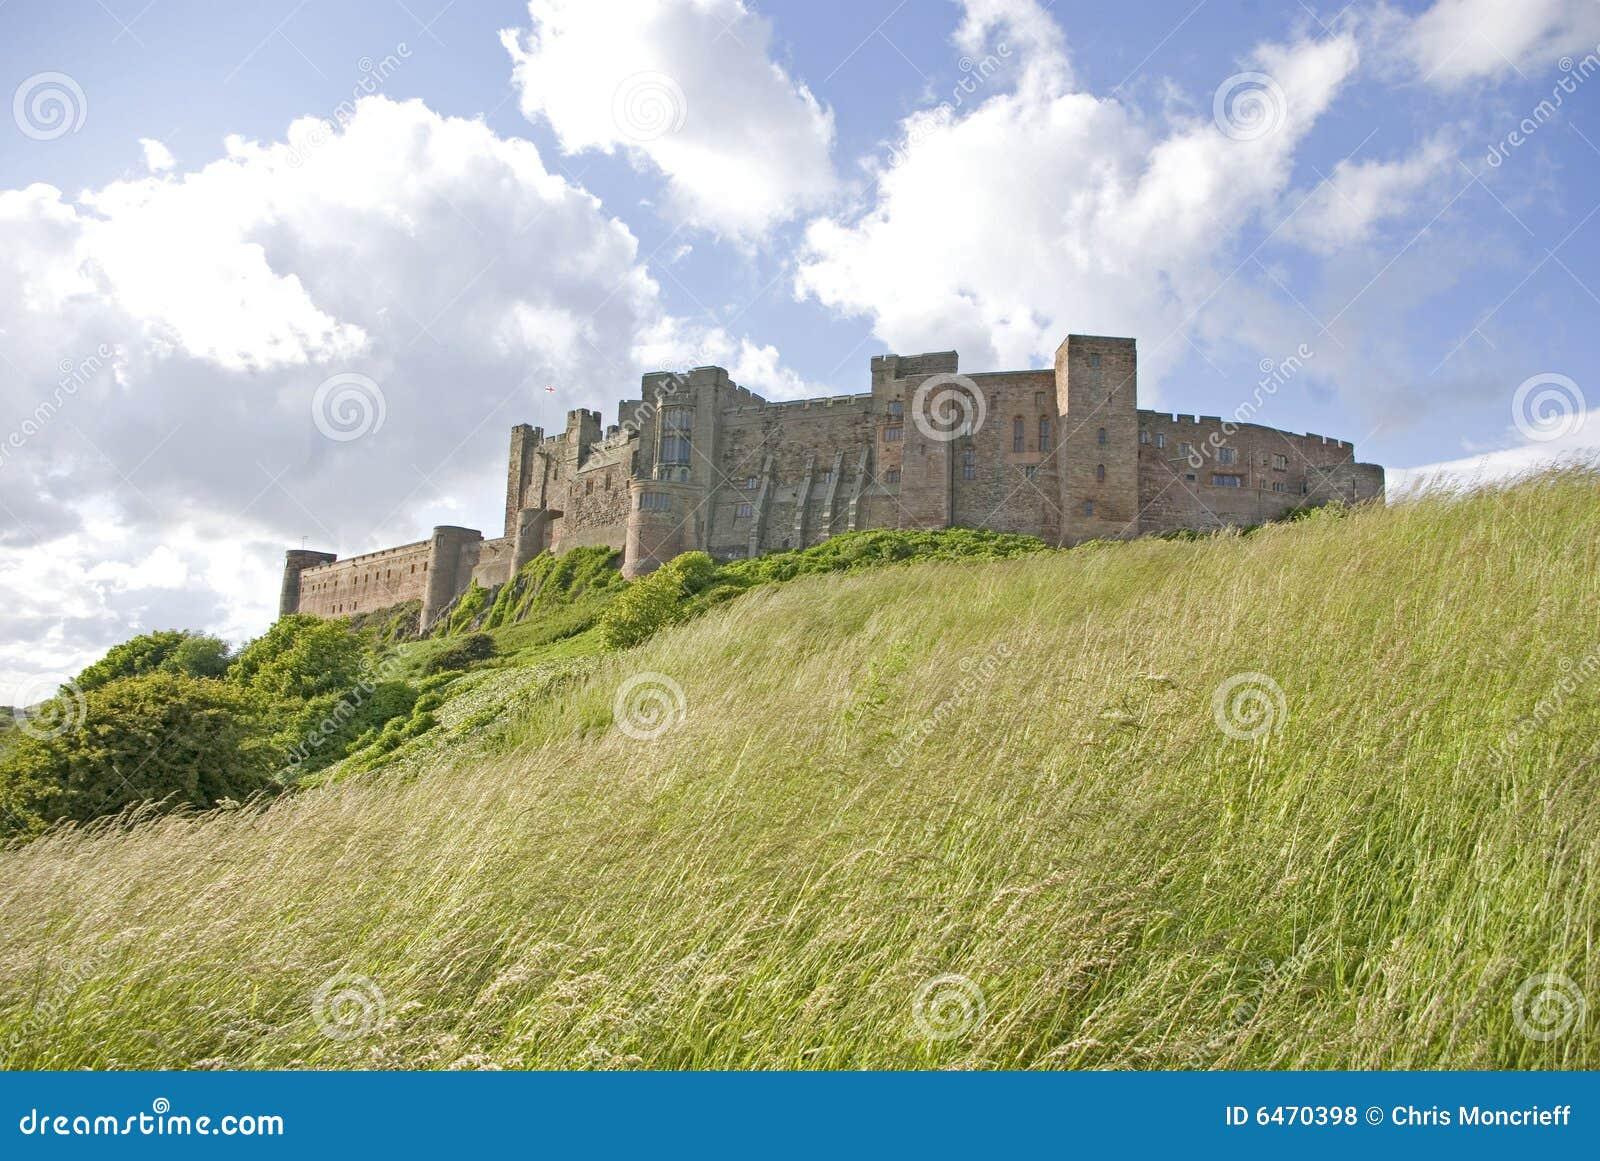 Castillo de Bamburgh del sur